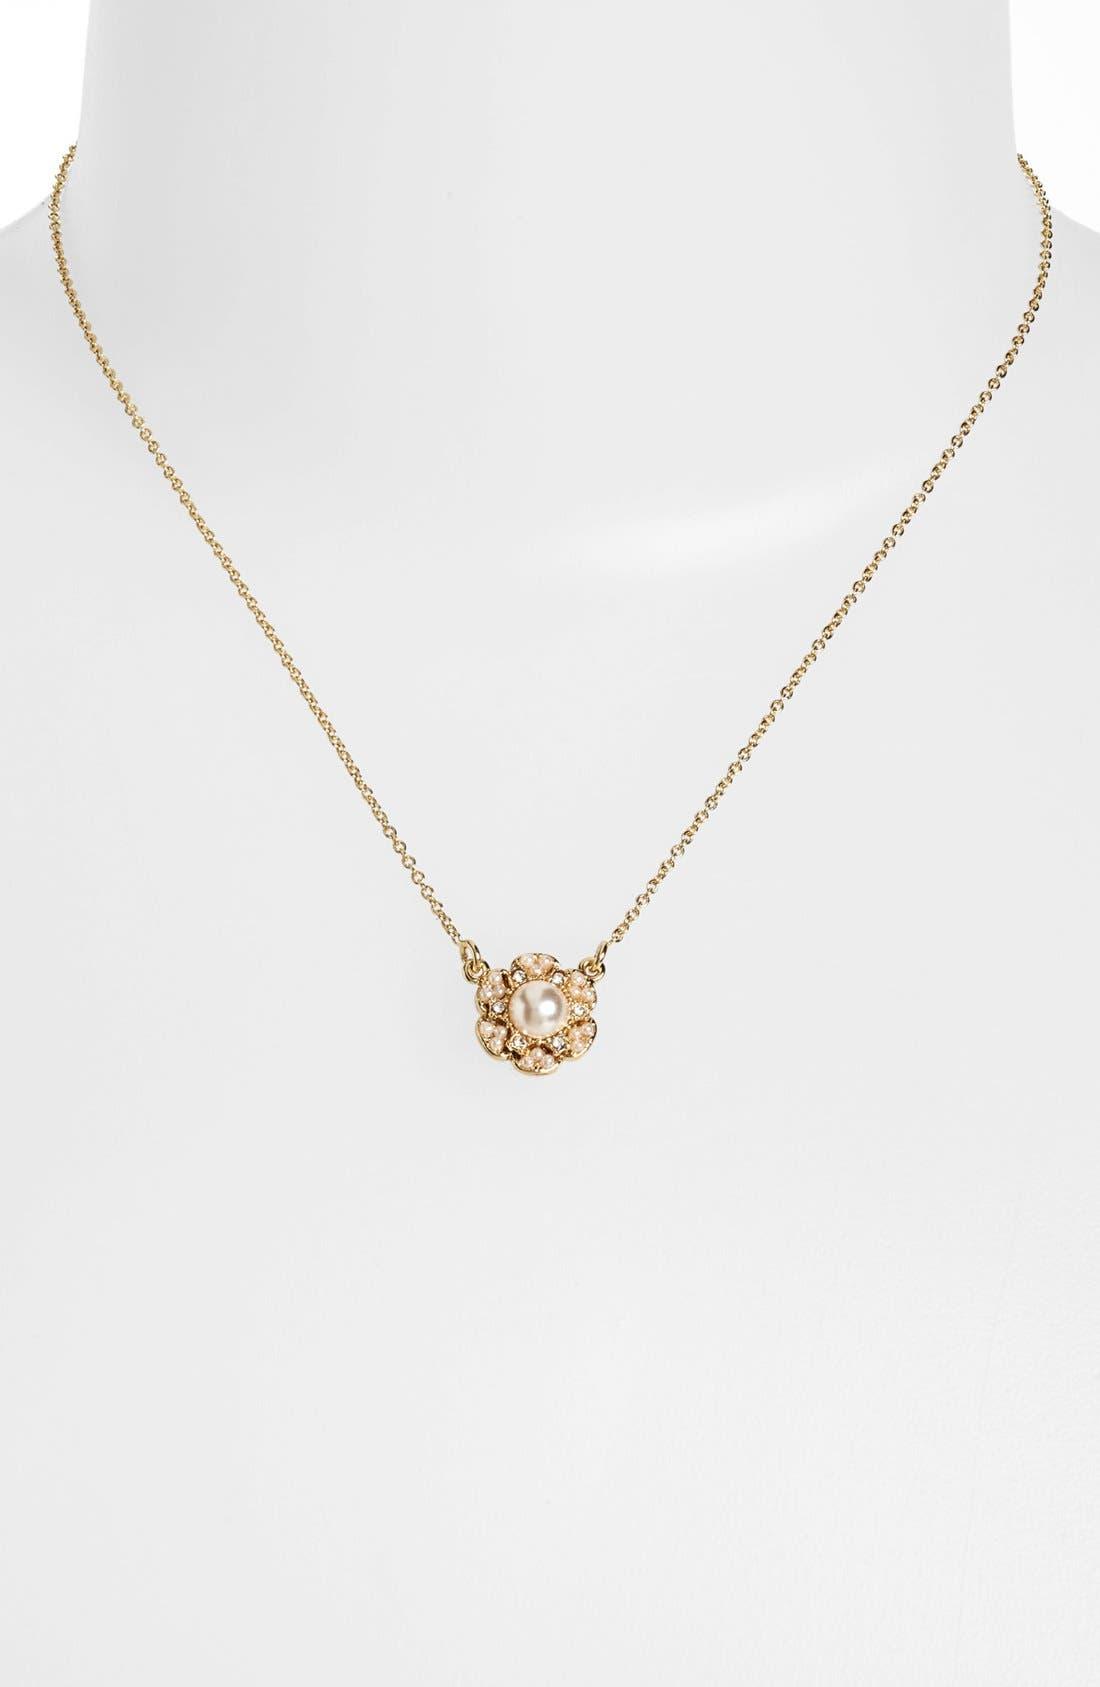 Alternate Image 1 Selected - kate spade new york 'park floral' pendant necklace